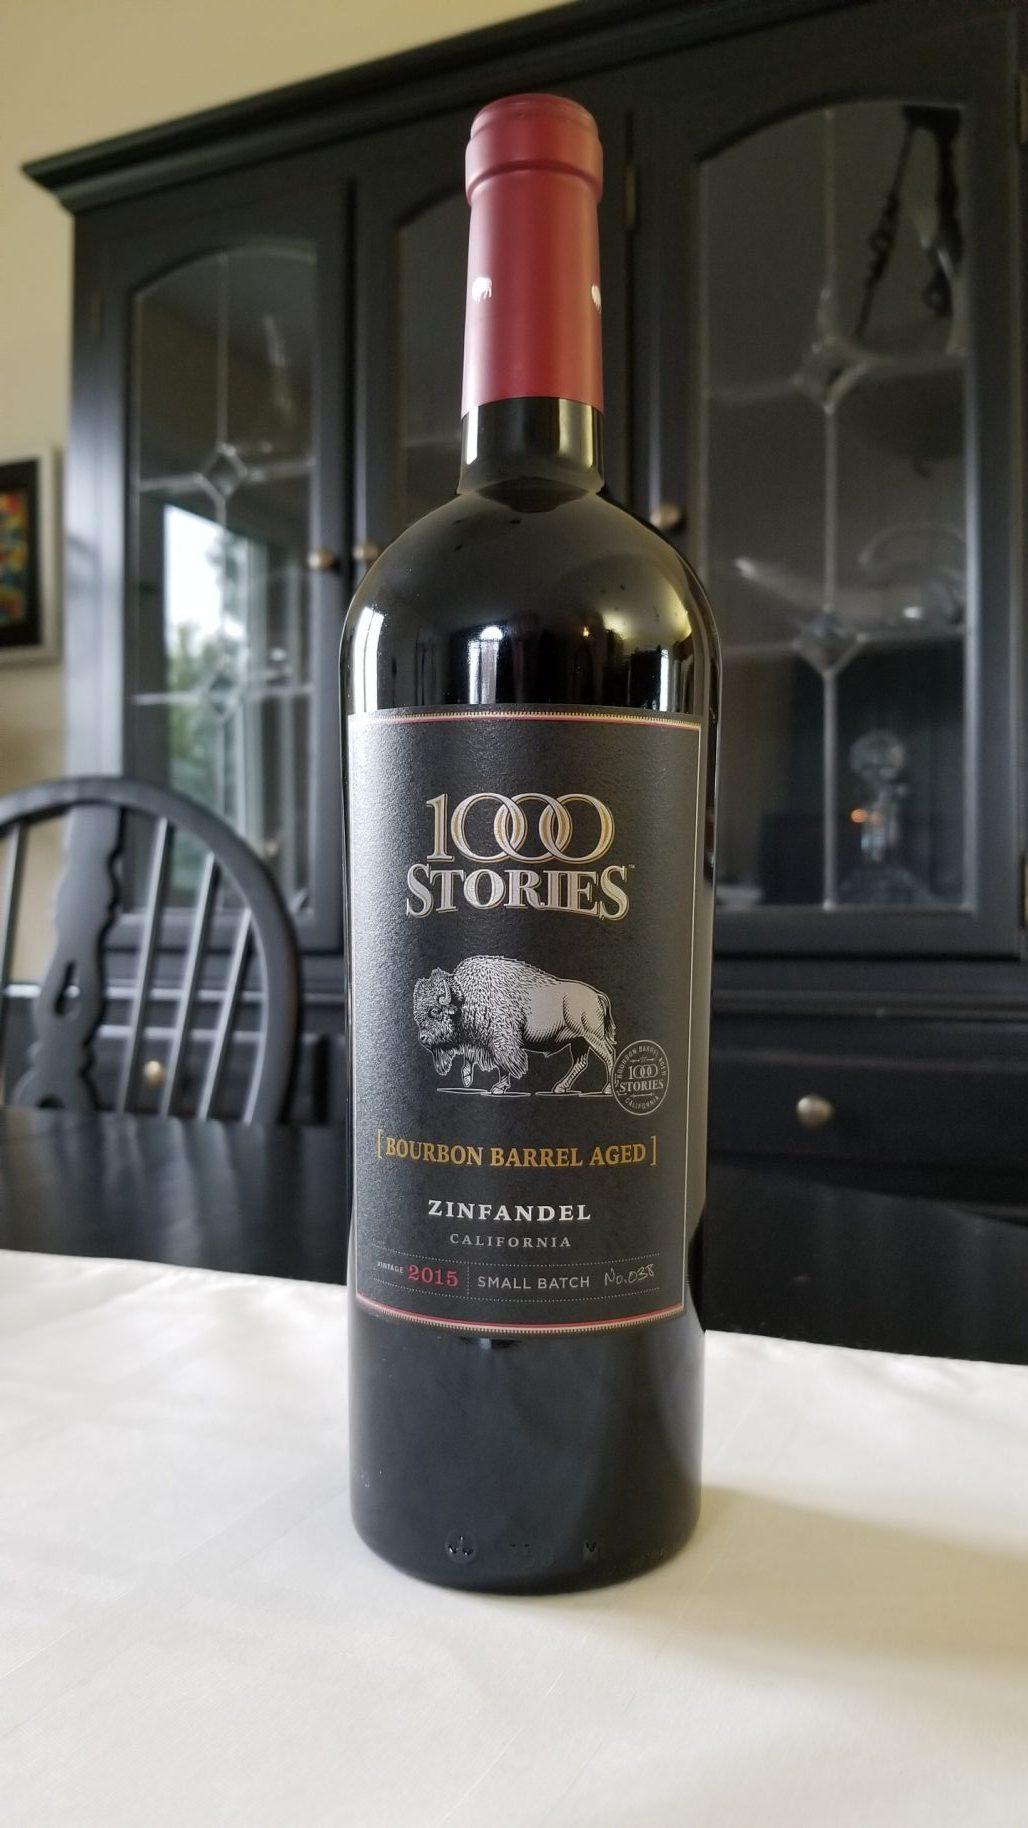 $29.95 - 1000 Stories Bourbon Barrel Aged Zinfandel 2015